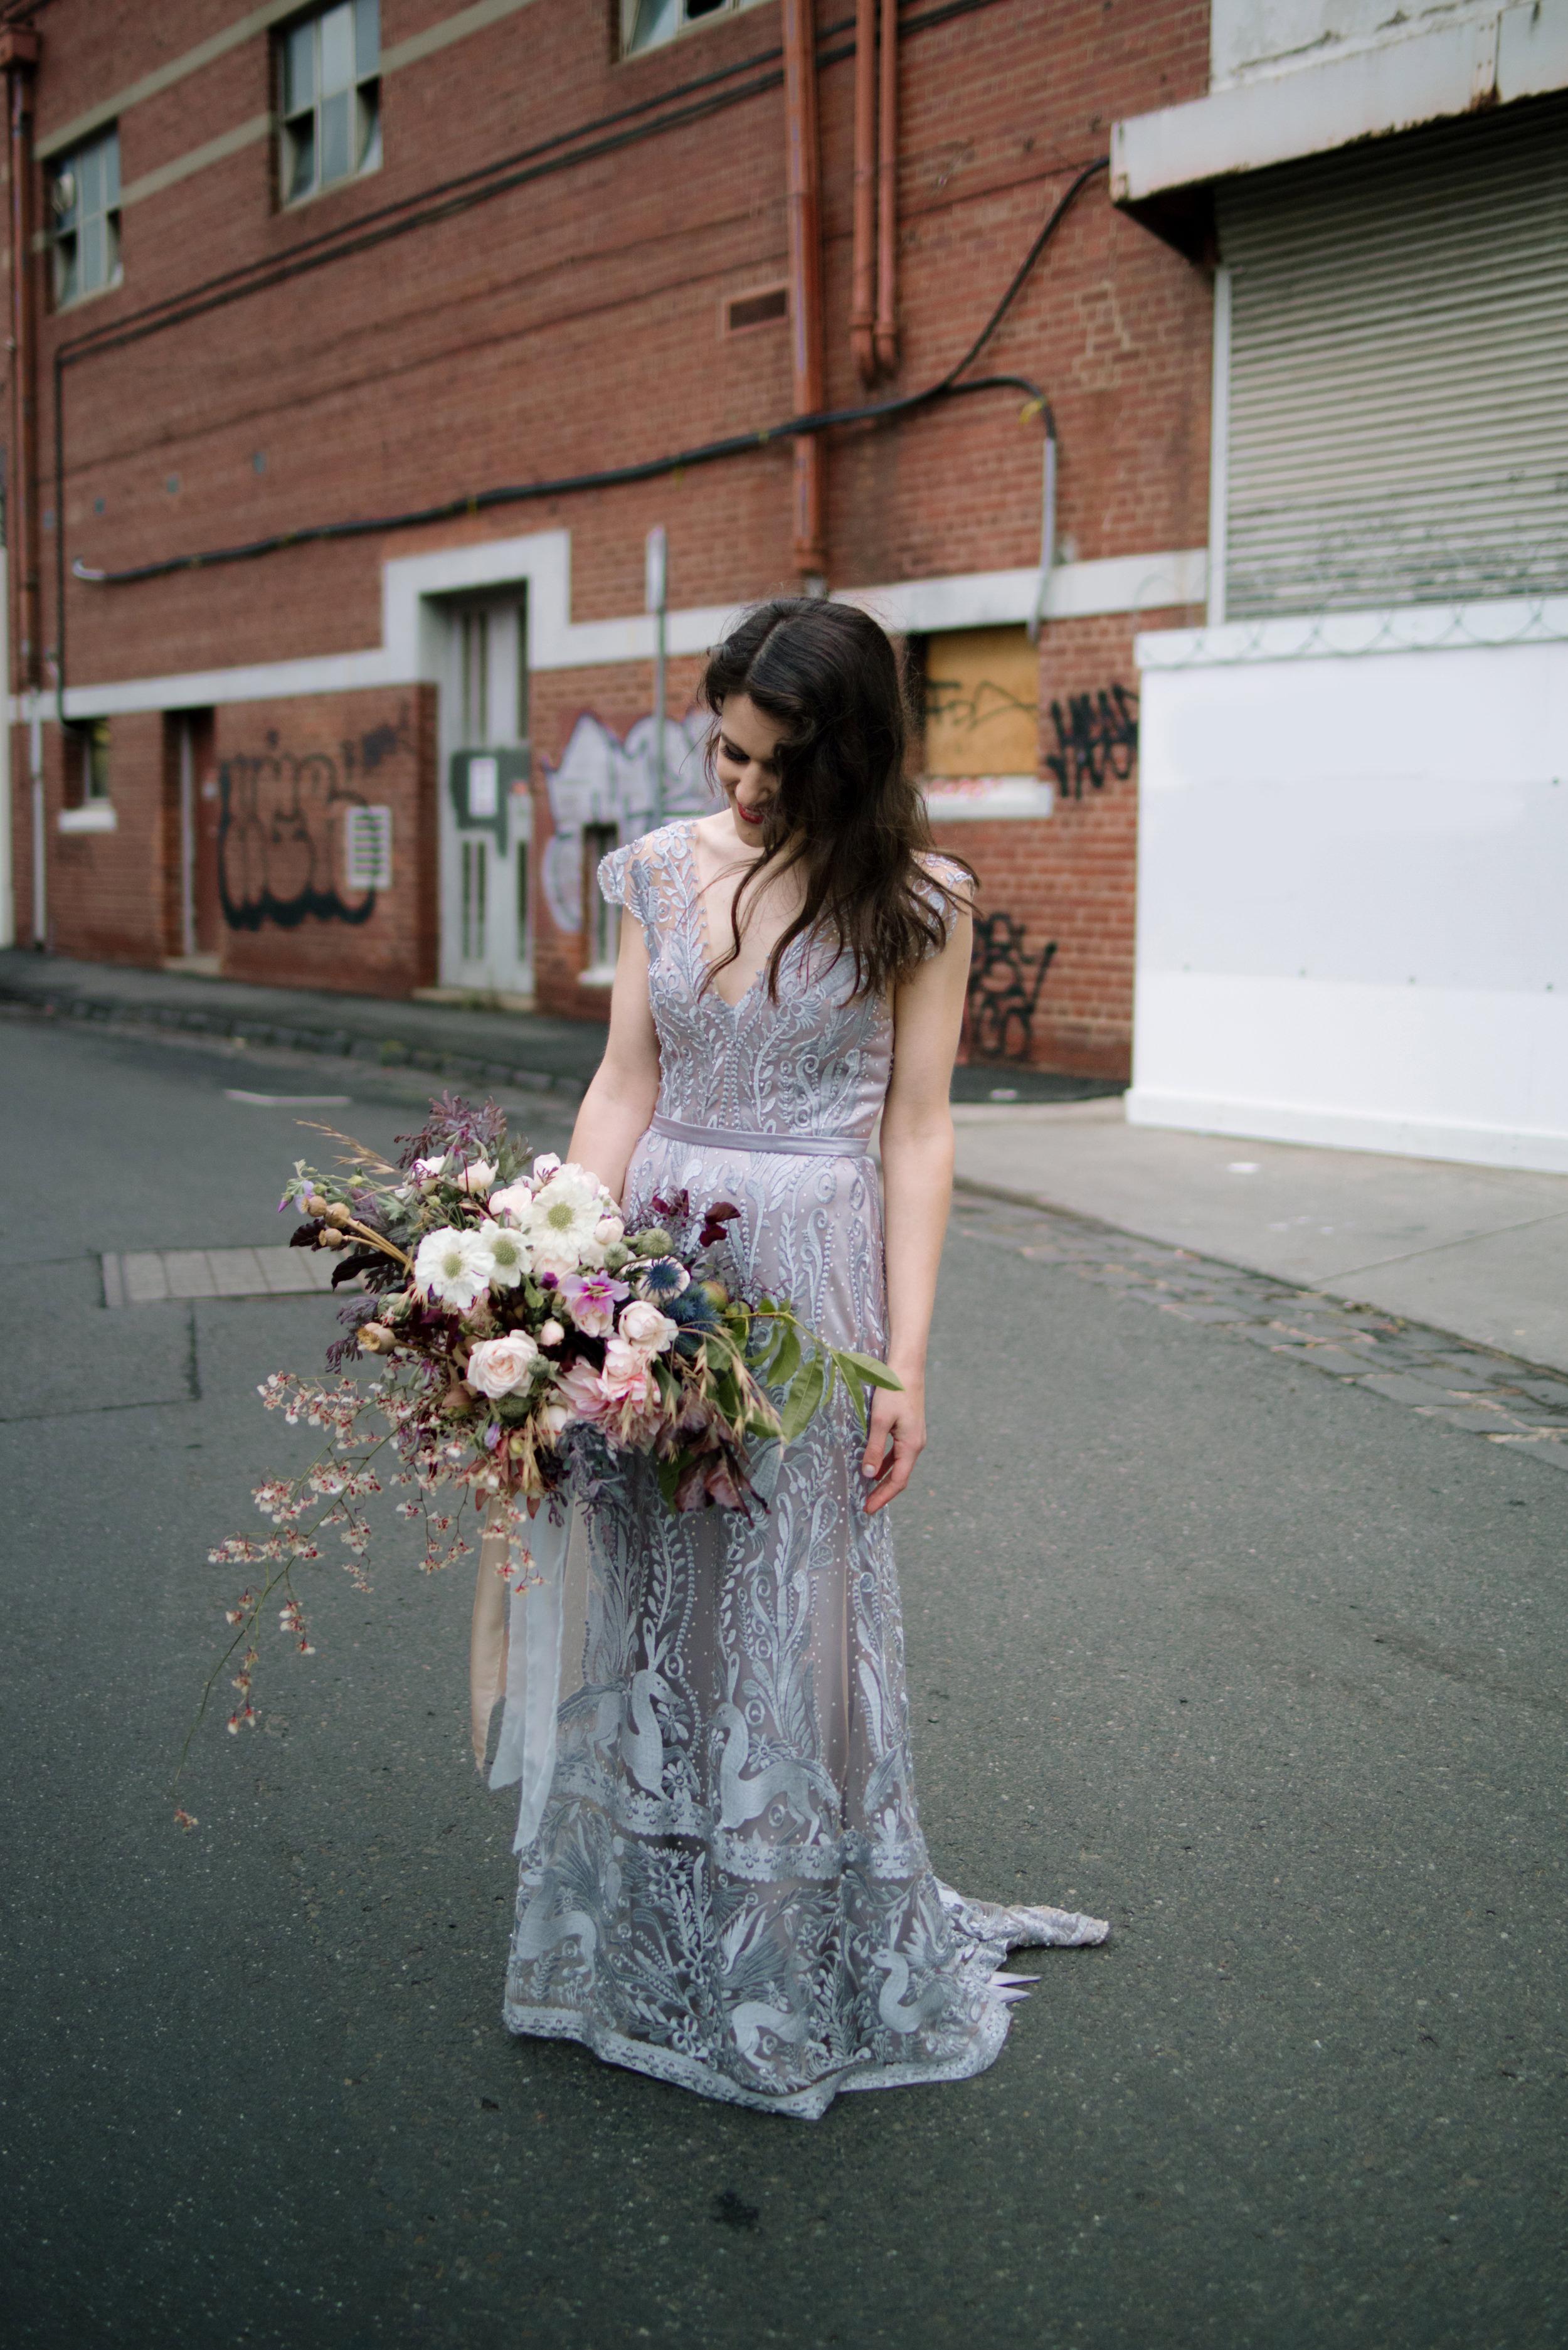 I-Got-You-Babe-&.Co.-Glasshaus-Wedding-Charlotte-Cameron0108.JPG